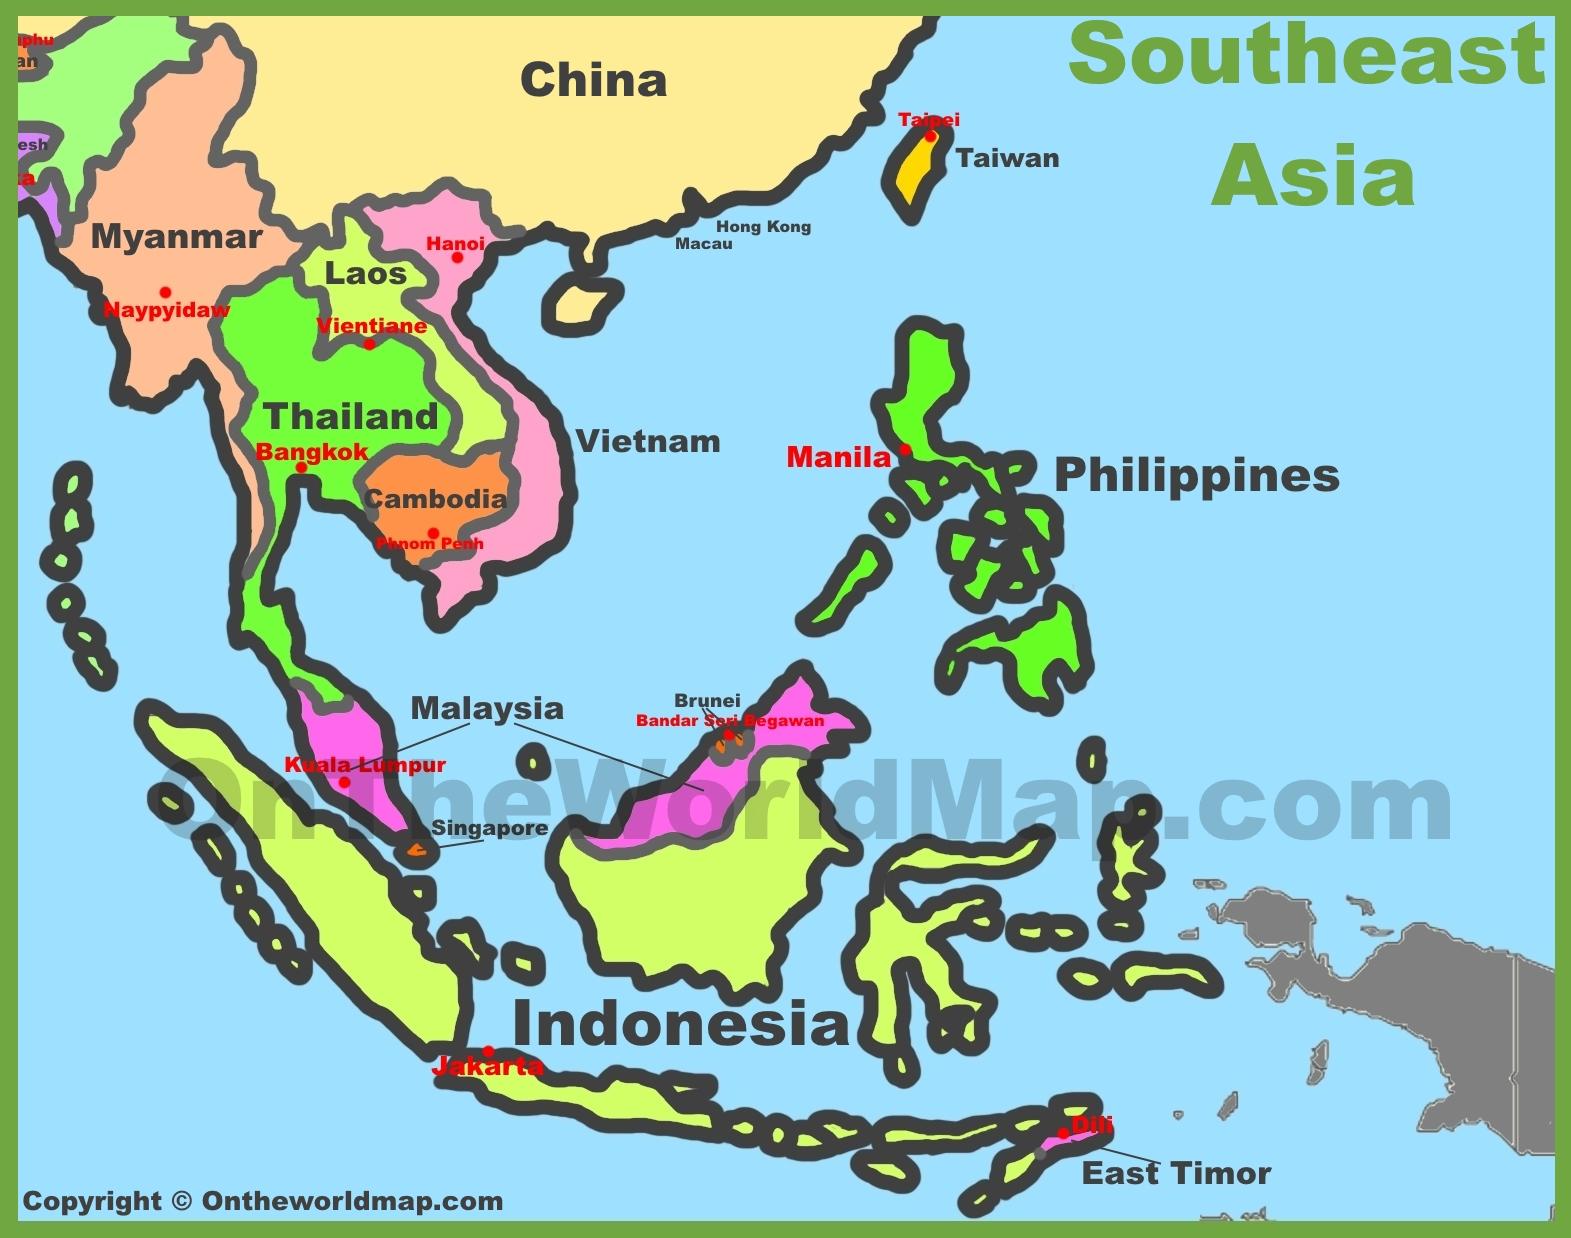 Southeastern Asia Map Map of Southeast Asia (Southeastern Asia)